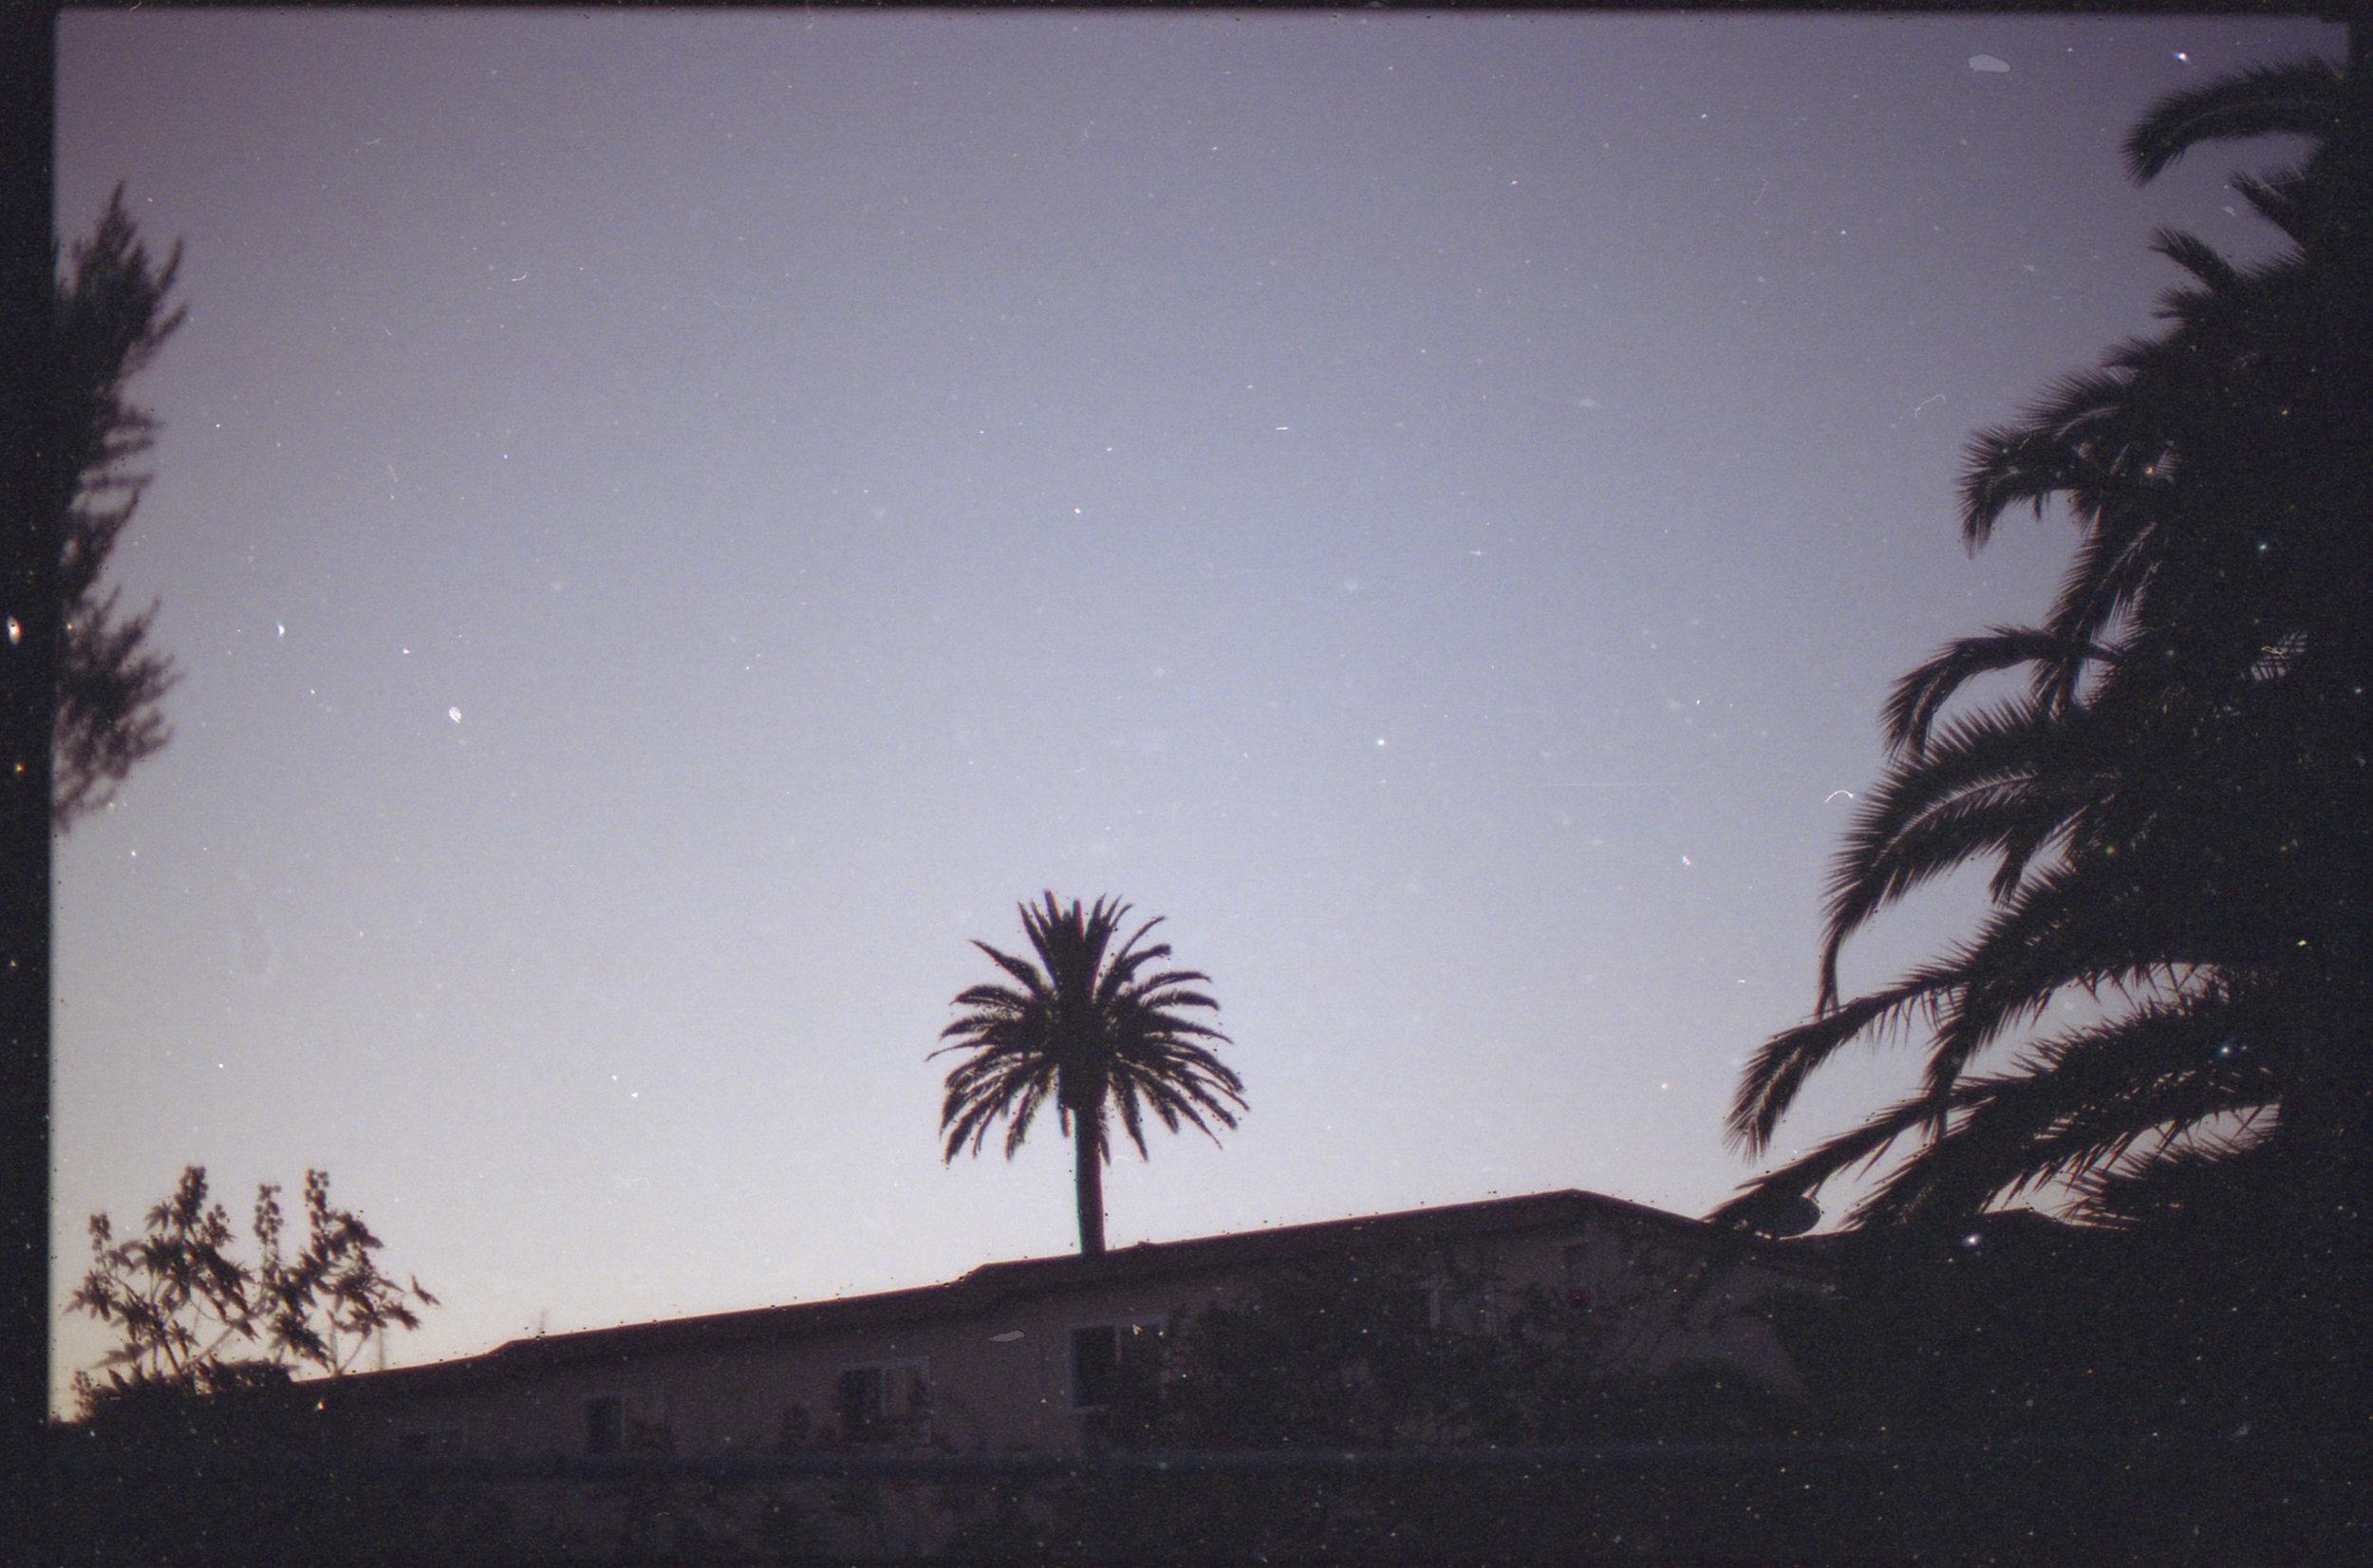 mkl_stars_01.jpg